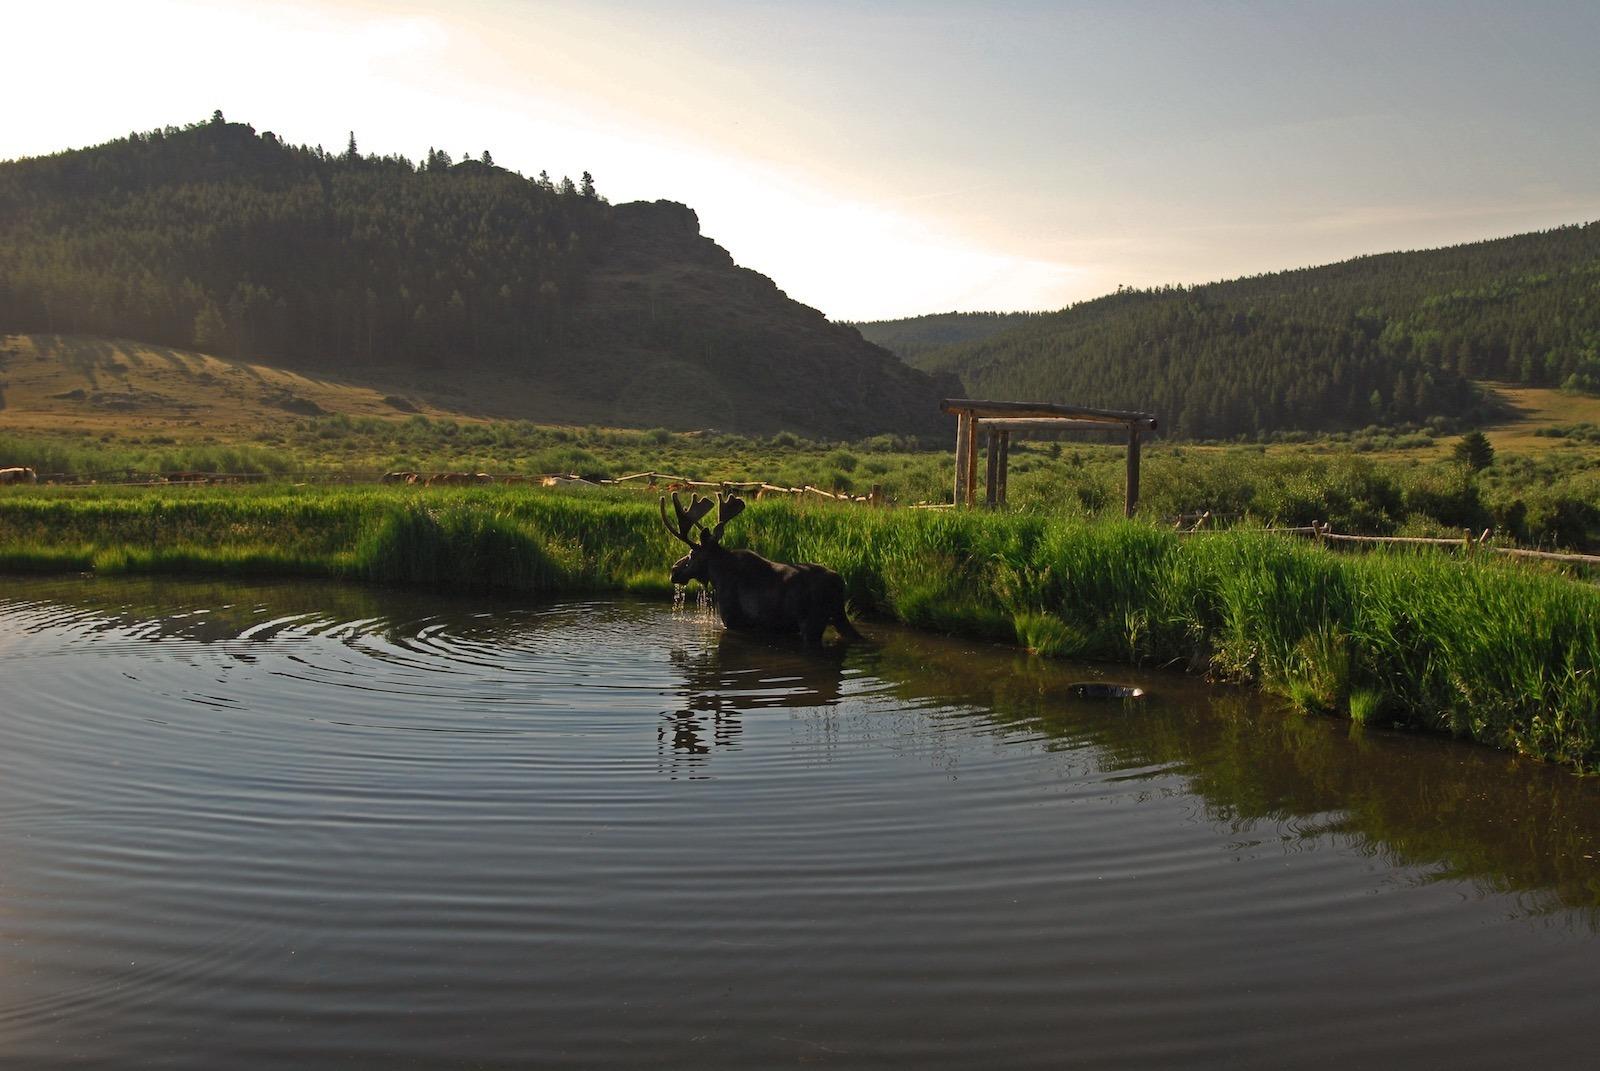 Moose at Paradise Guest Ranch